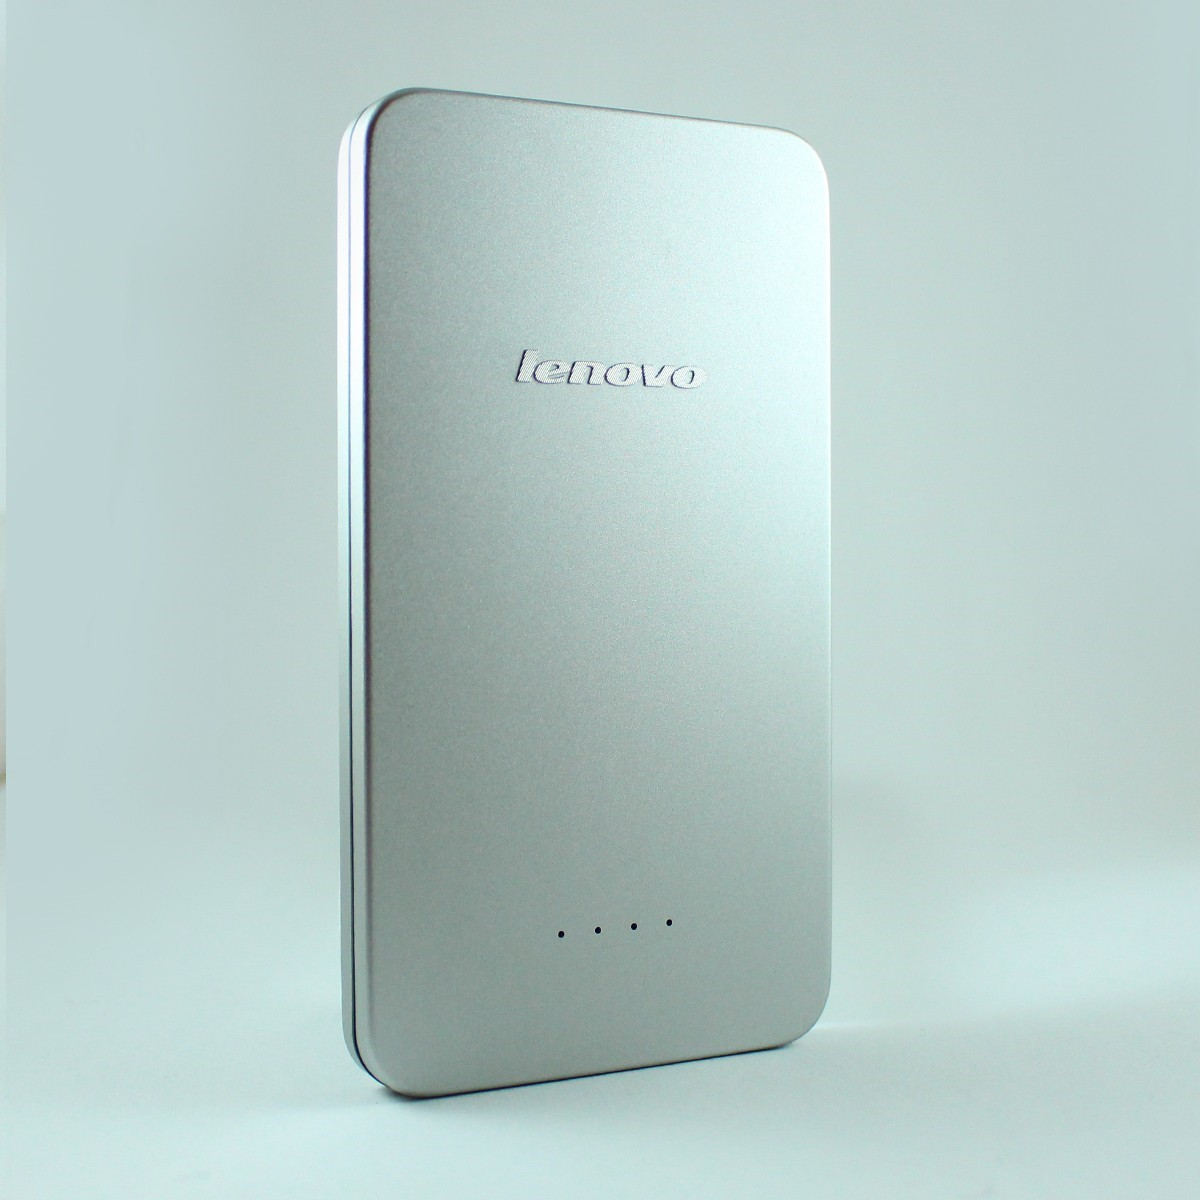 Lenovo Pb410 5000 mAh Powerbank